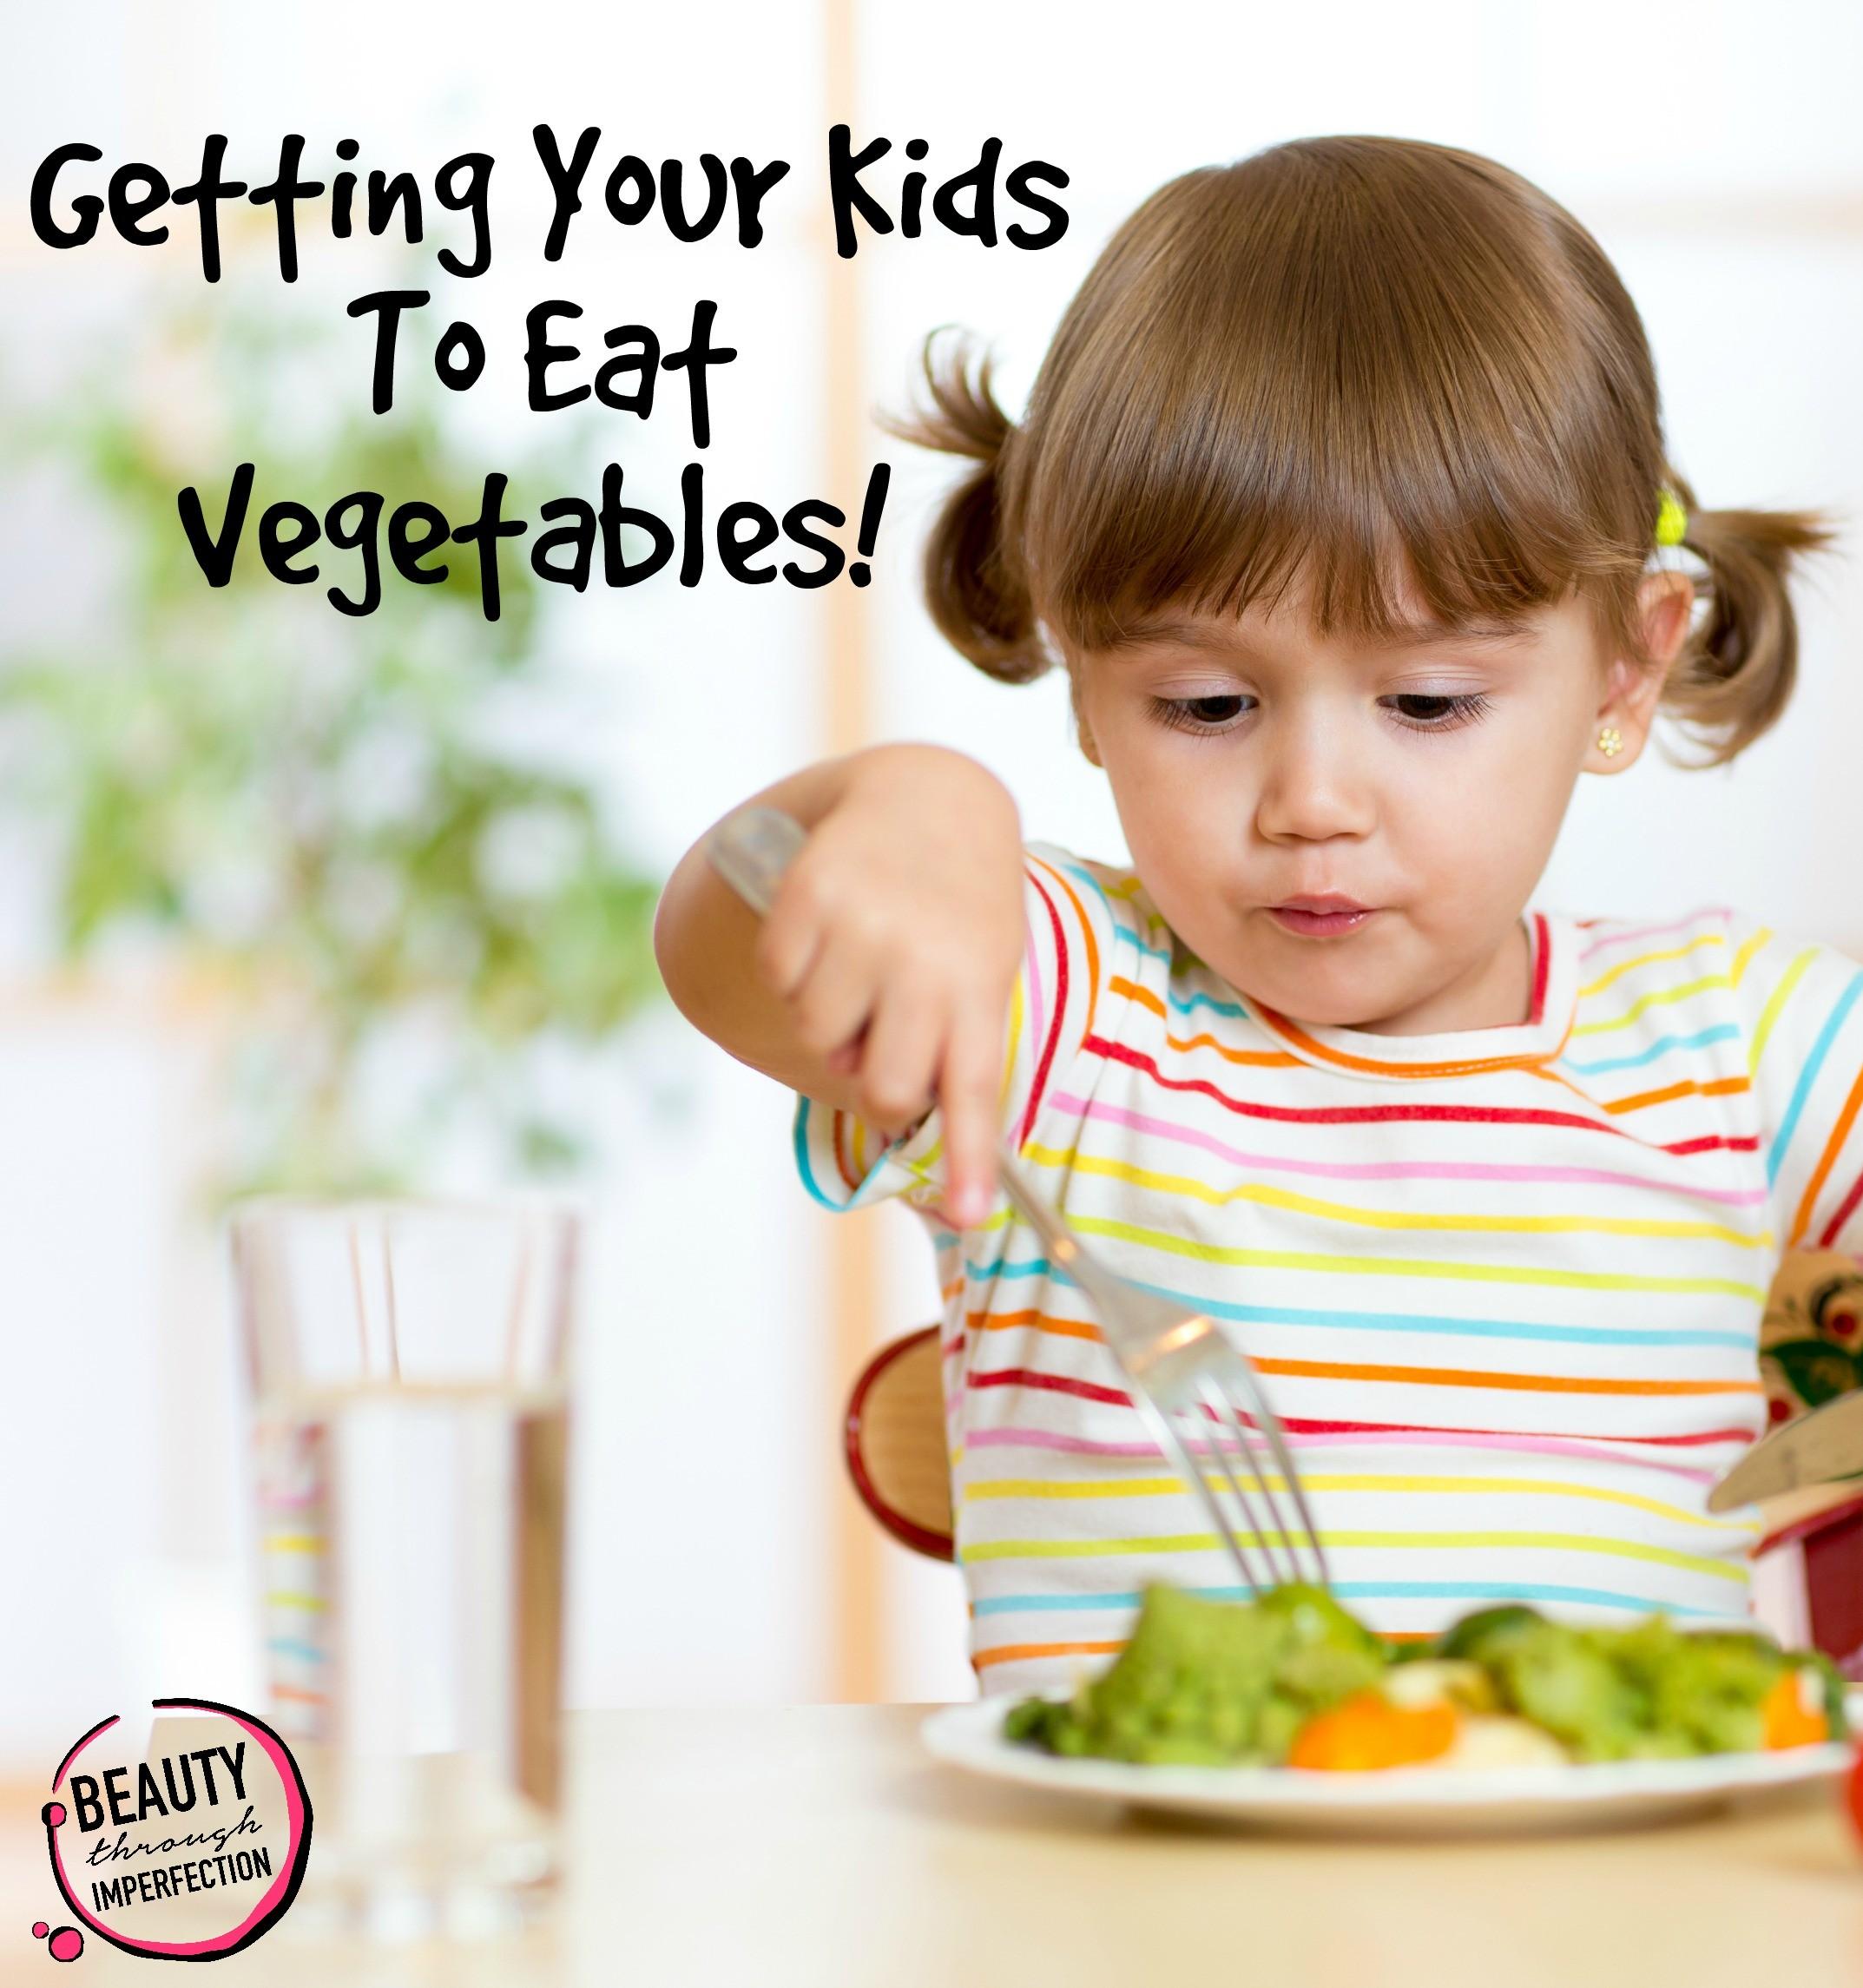 kid girl eating healthy food at home or kindergarten